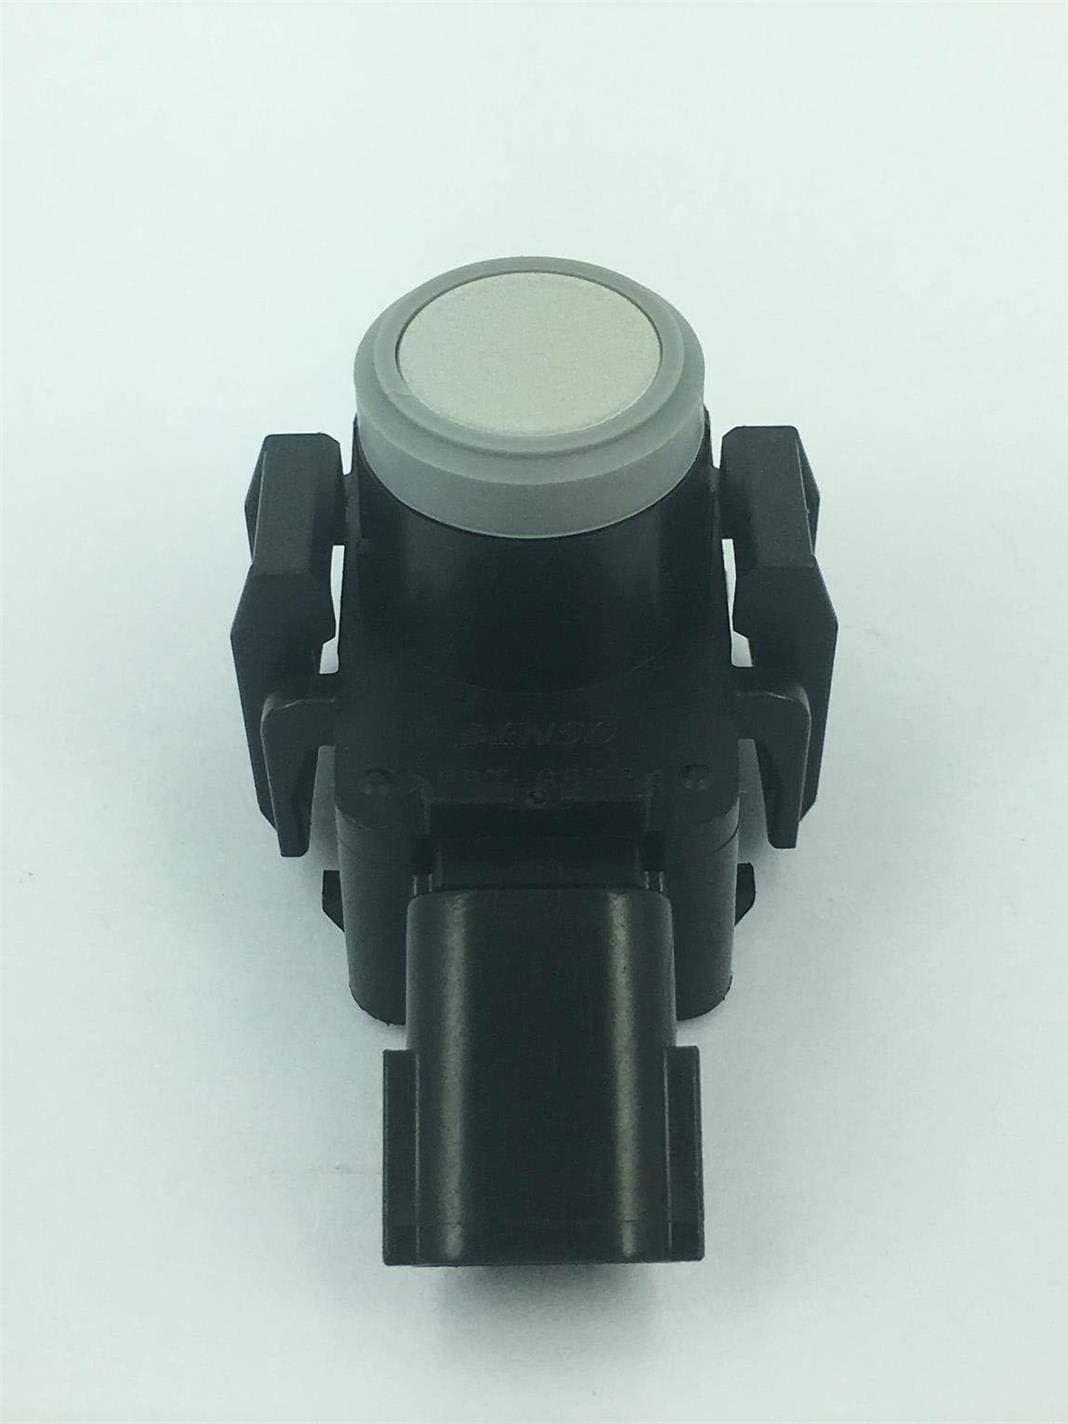 AUTOS-FAMILY PDC Parking Sensor 89341-30010-B0 8934130010